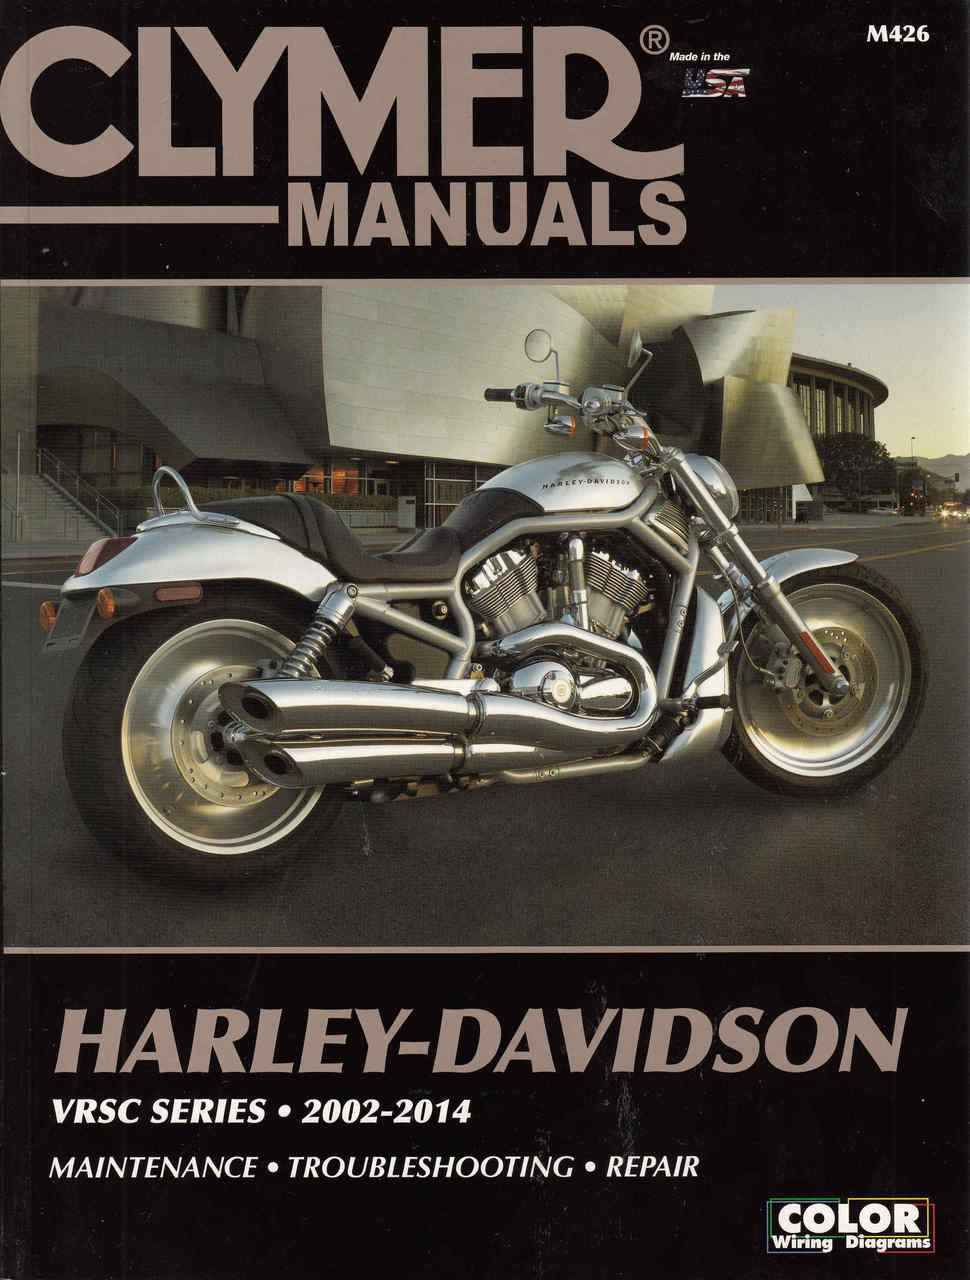 harley davidson vrsc series 2002 2014 workshop manual  [ 970 x 1280 Pixel ]